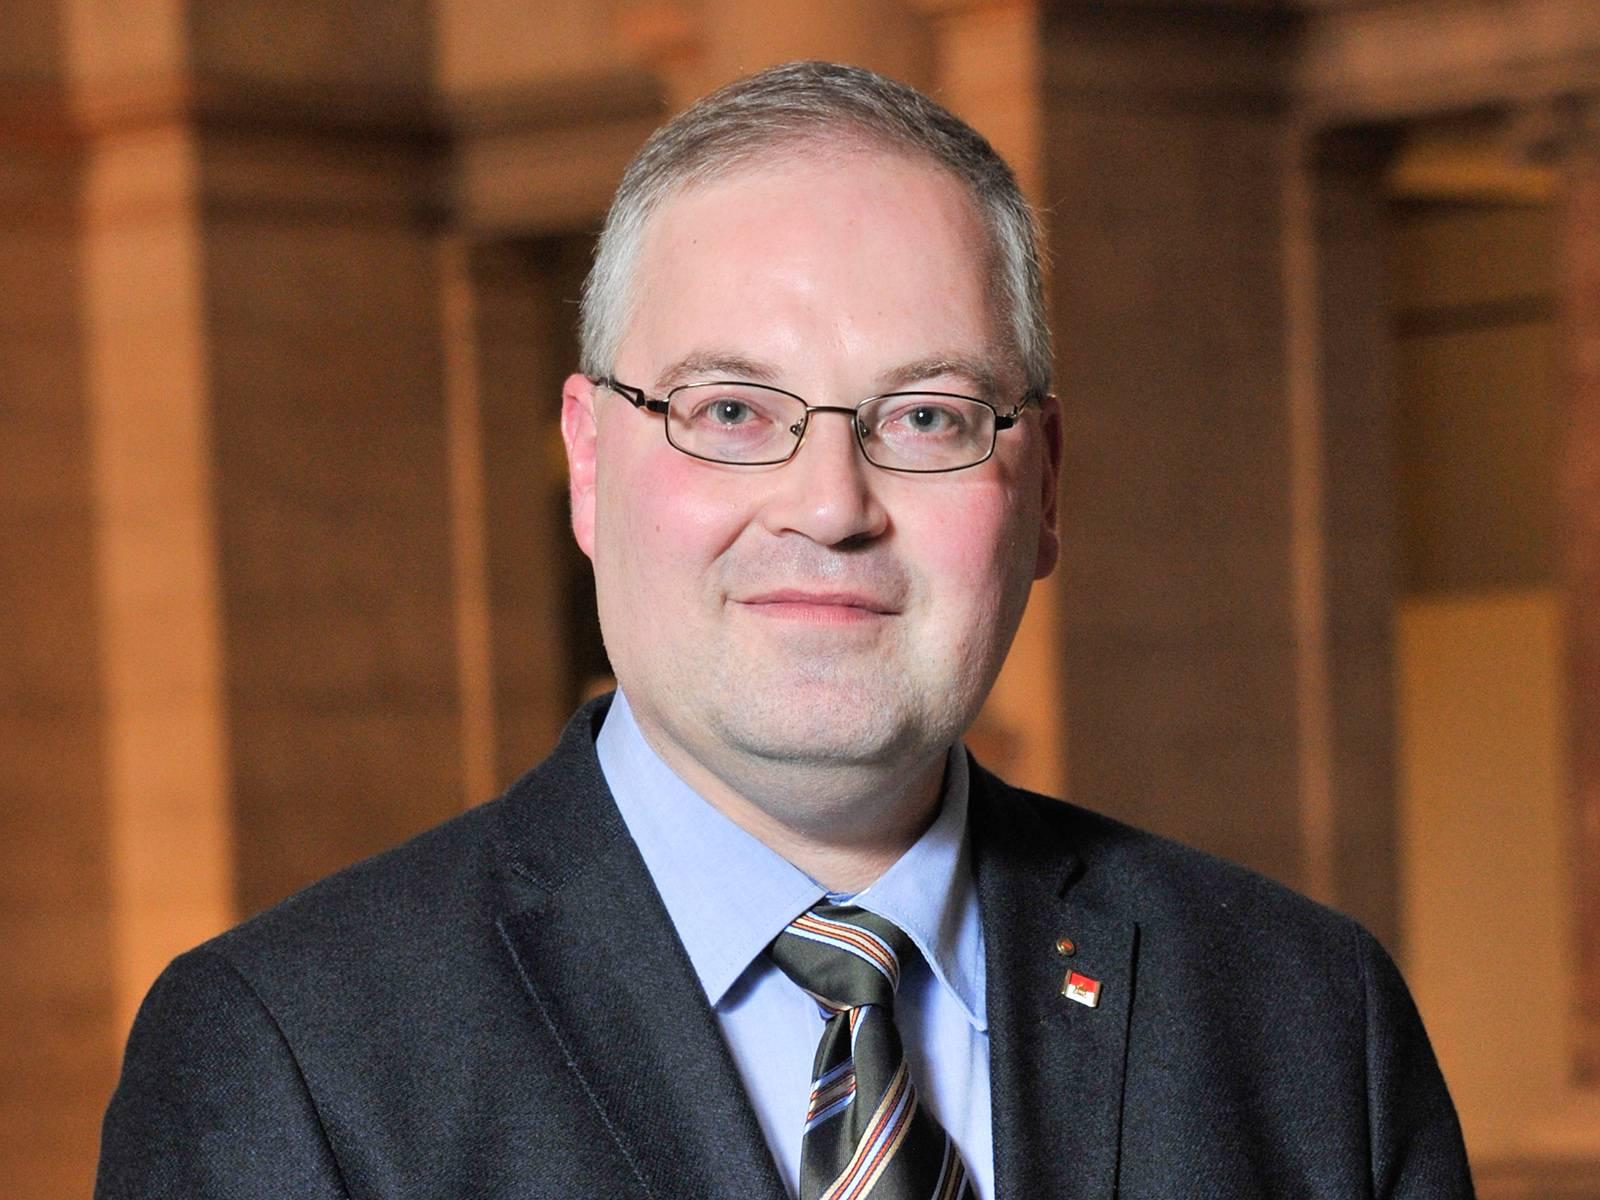 Lars Pohl